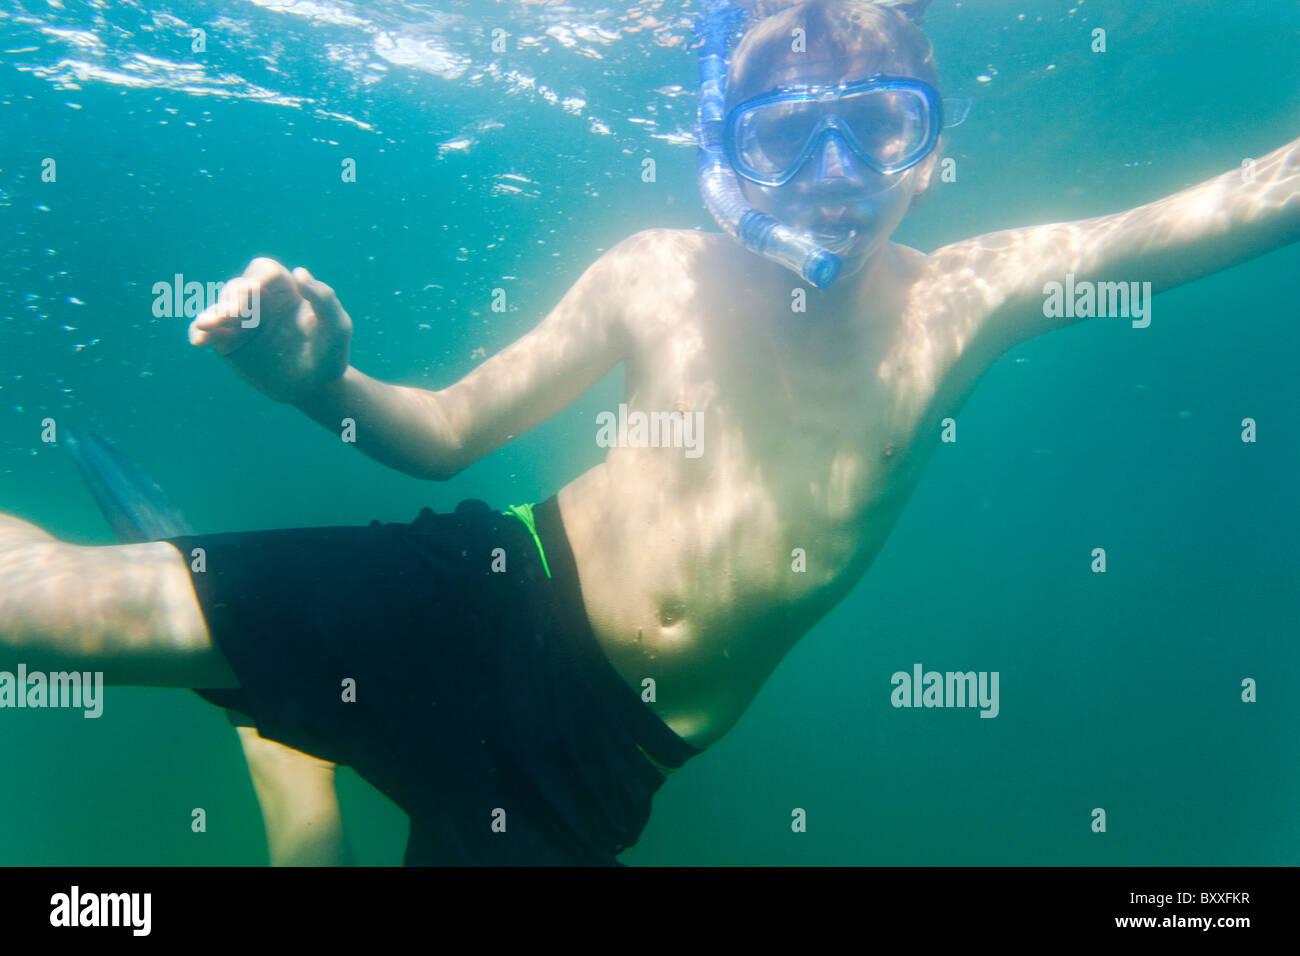 Adolescente snorkeling in acqua del Salto(Saltö) Svezia Foto Stock